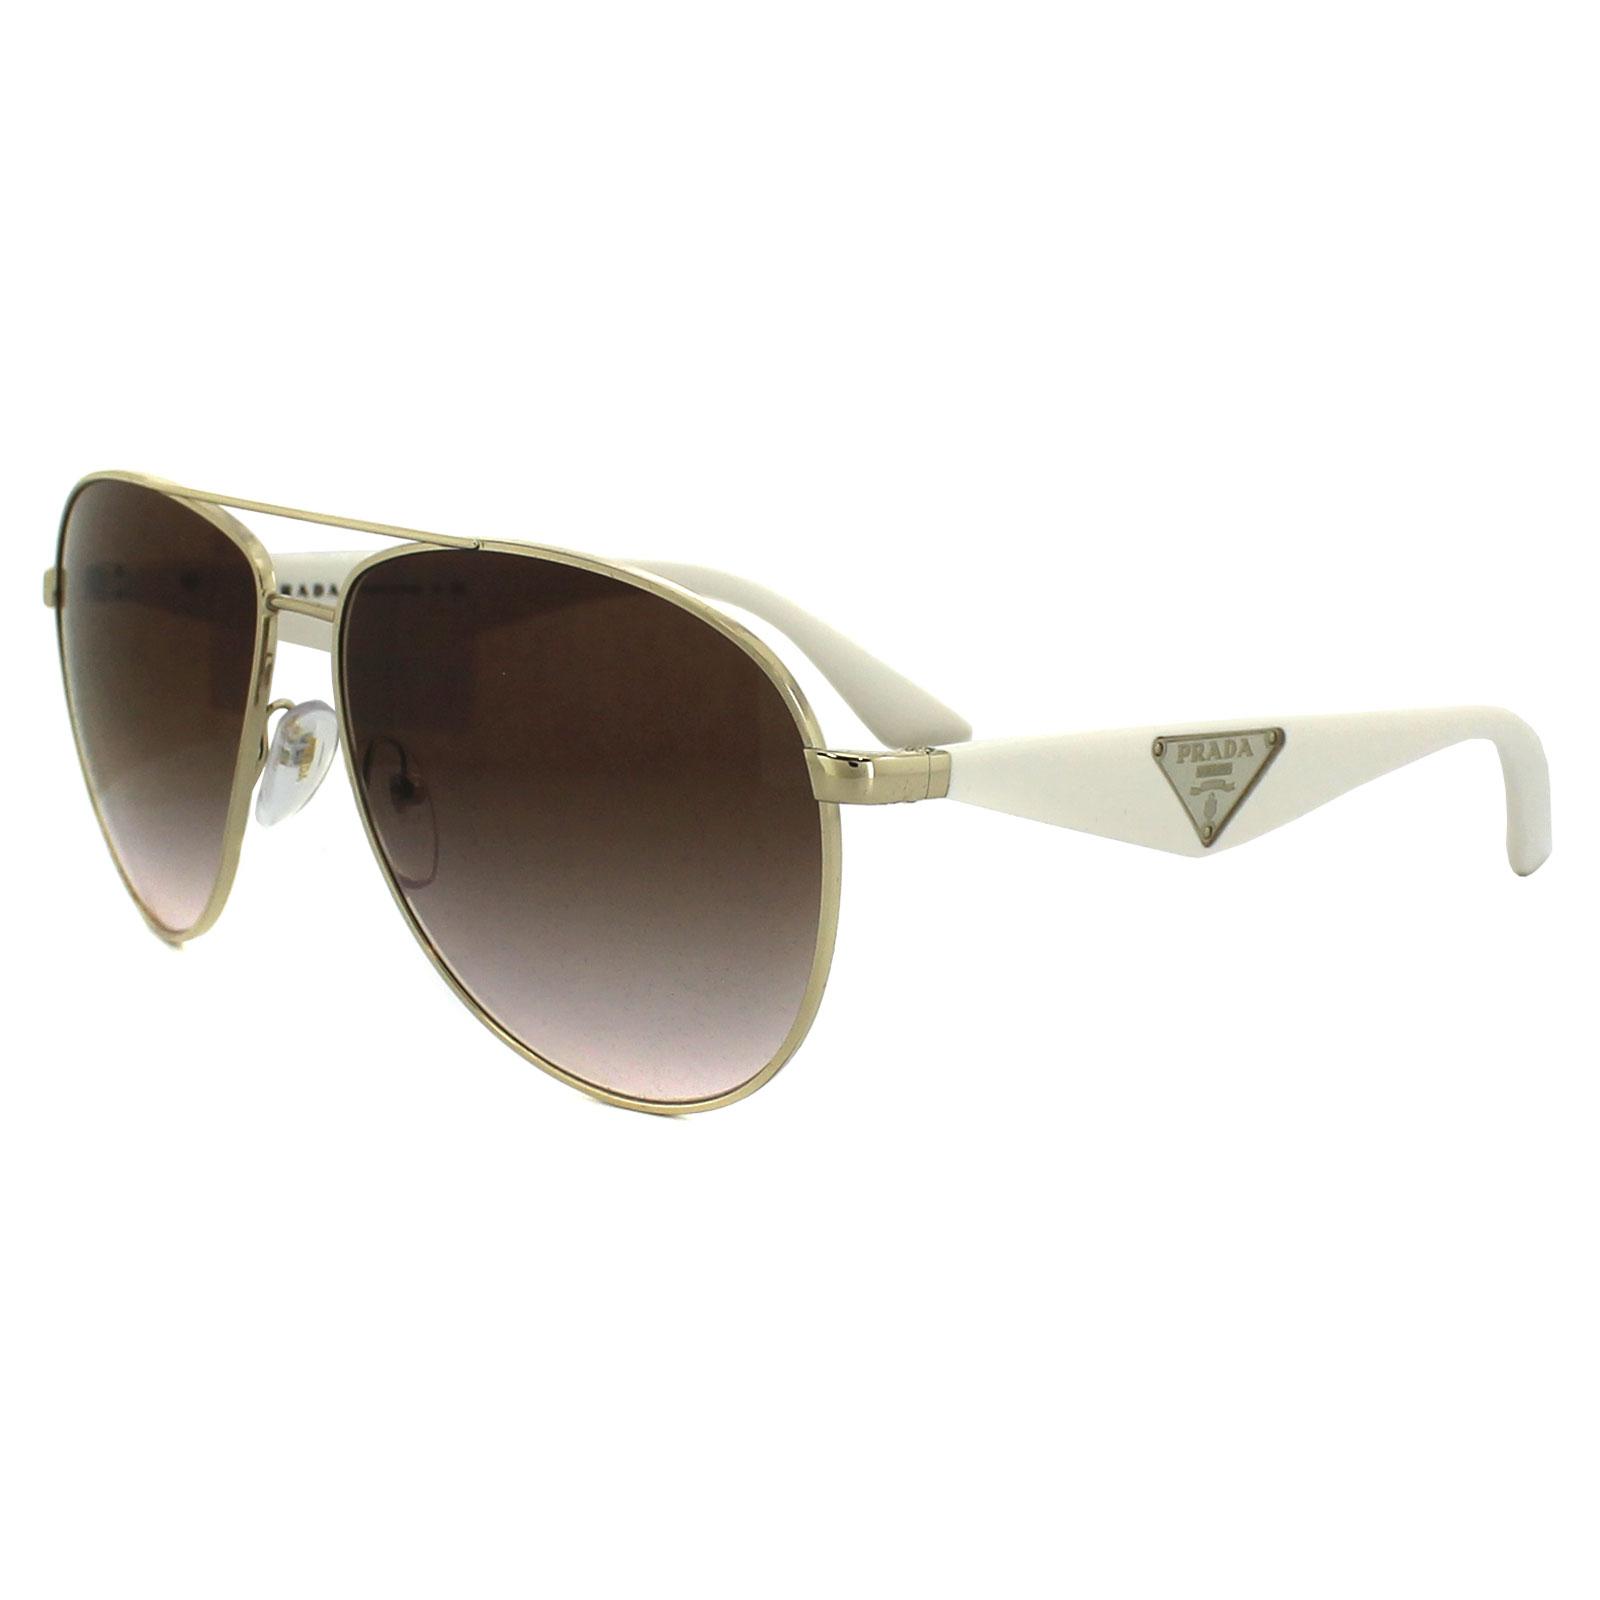 Prada Sunglasses 53QS ZVN0A6 Gold & White Brown Gradient ...